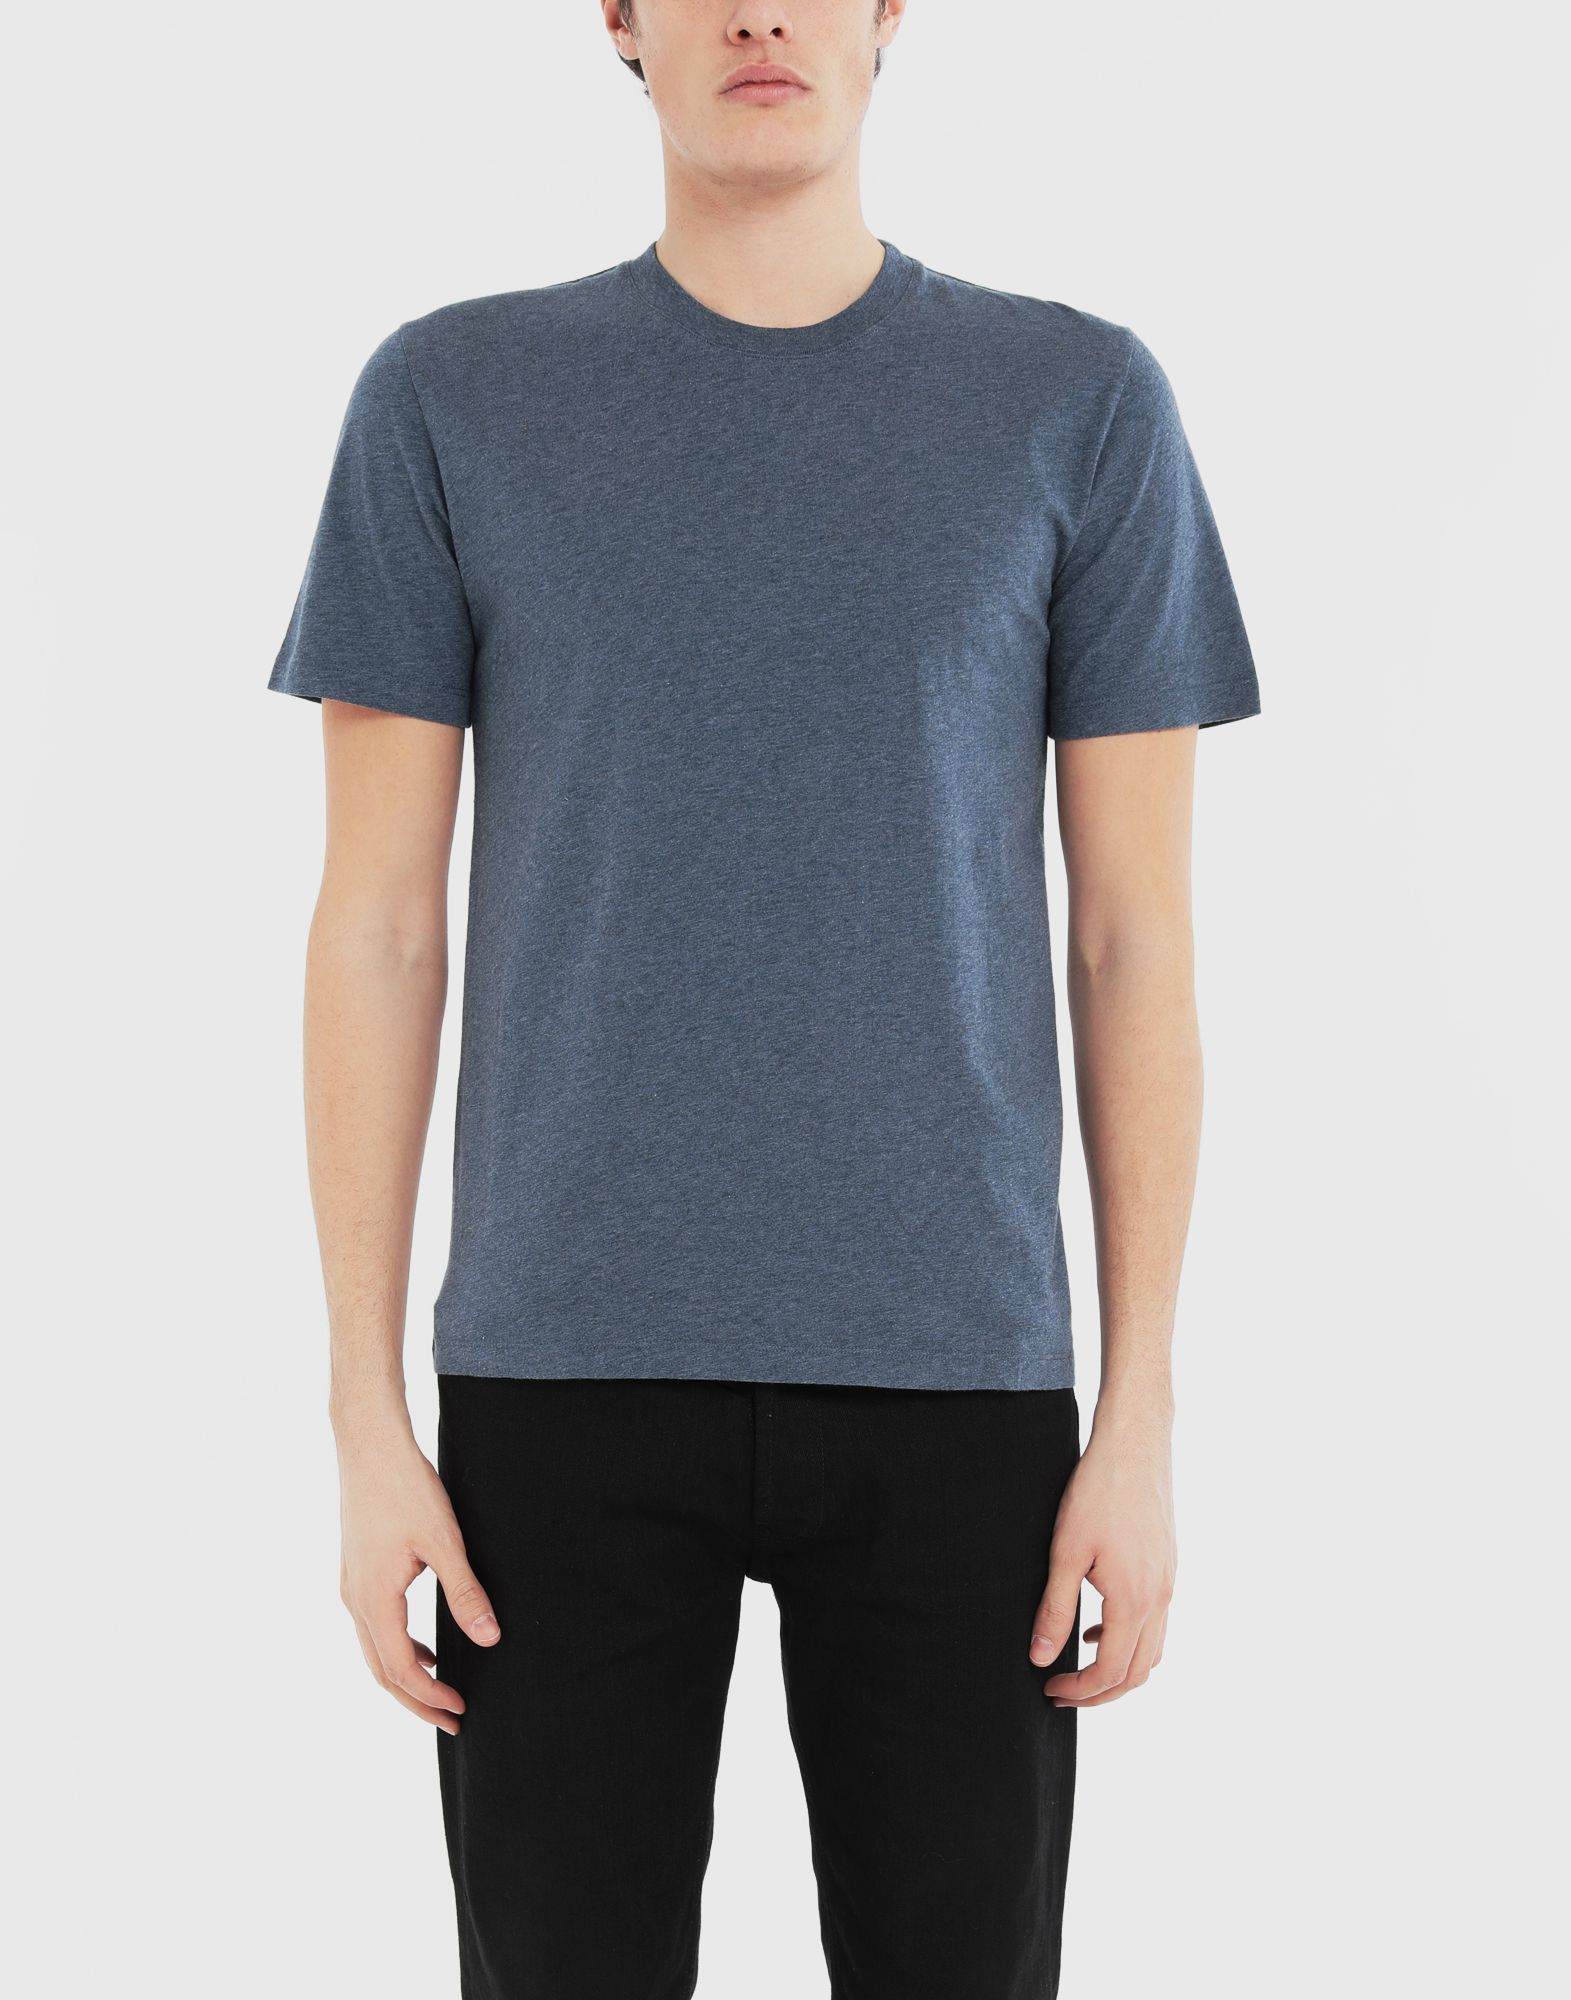 MAISON MARGIELA 3er Pack T-Shirts Stereotype Kurzärmliges T-Shirt Herren b